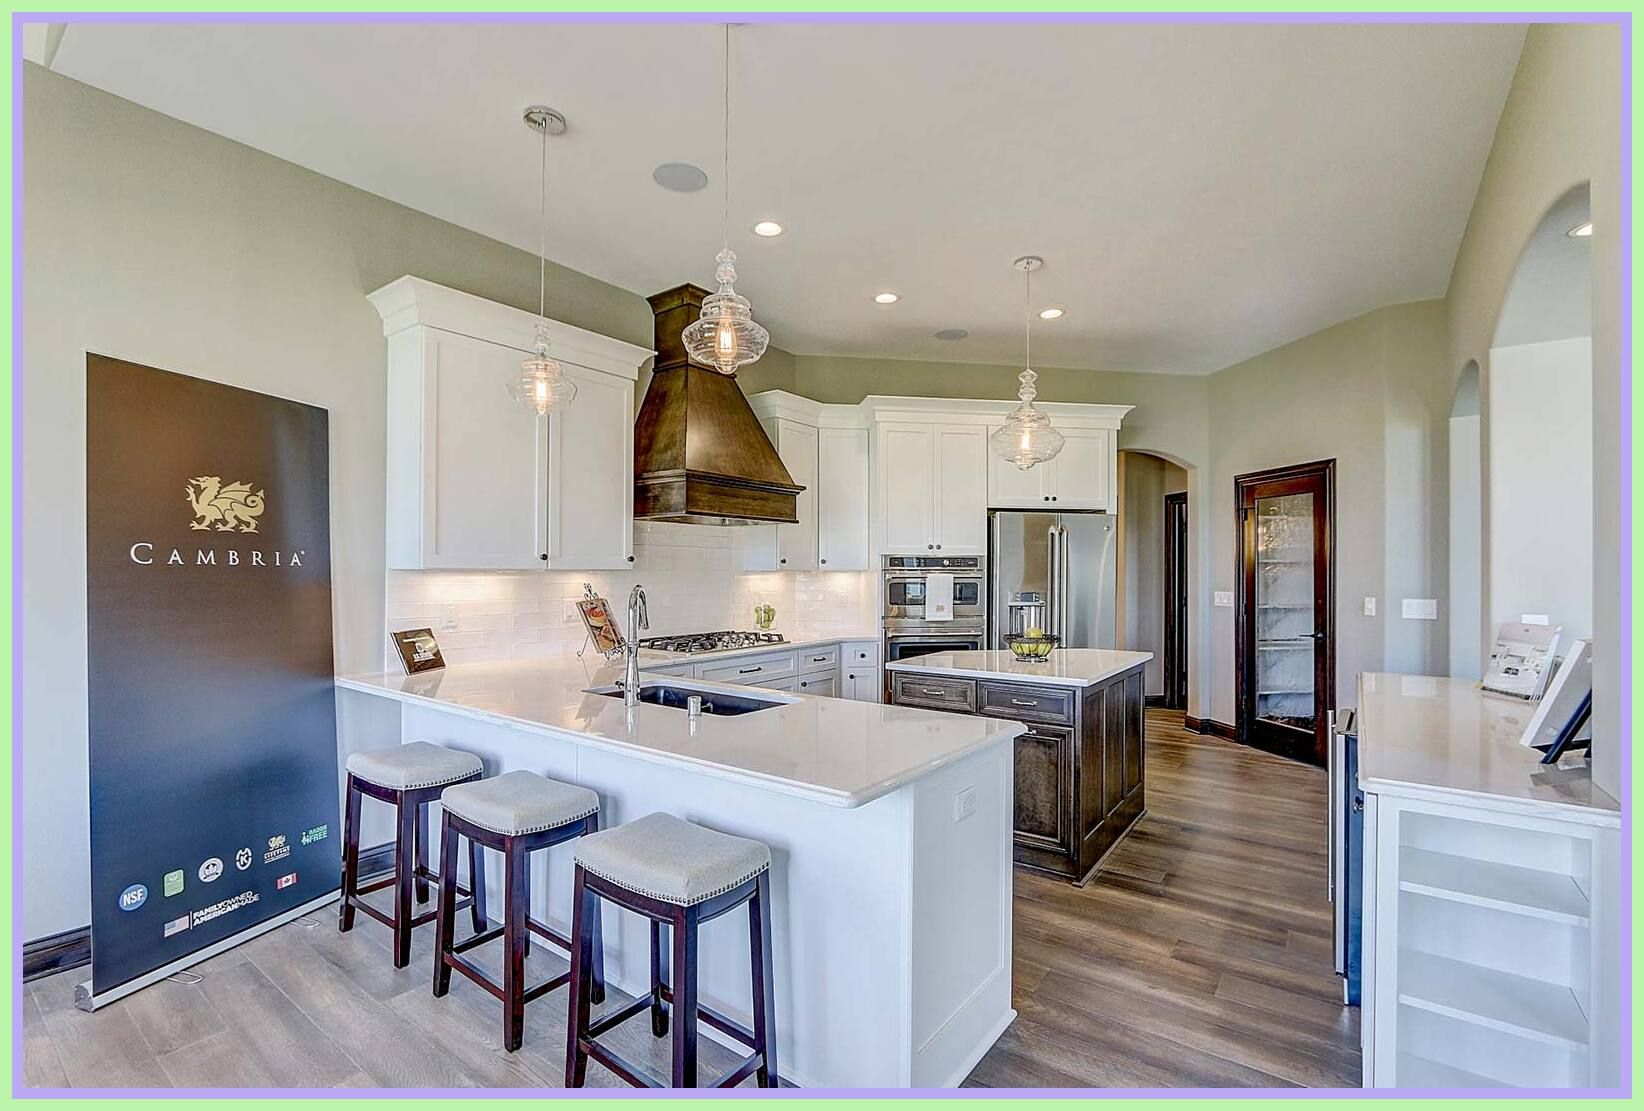 77 Reference Of Granite Countertops Vs Quartz Cost In 2020 Quartz Vs Granite Countertops Countertops Granite Countertops